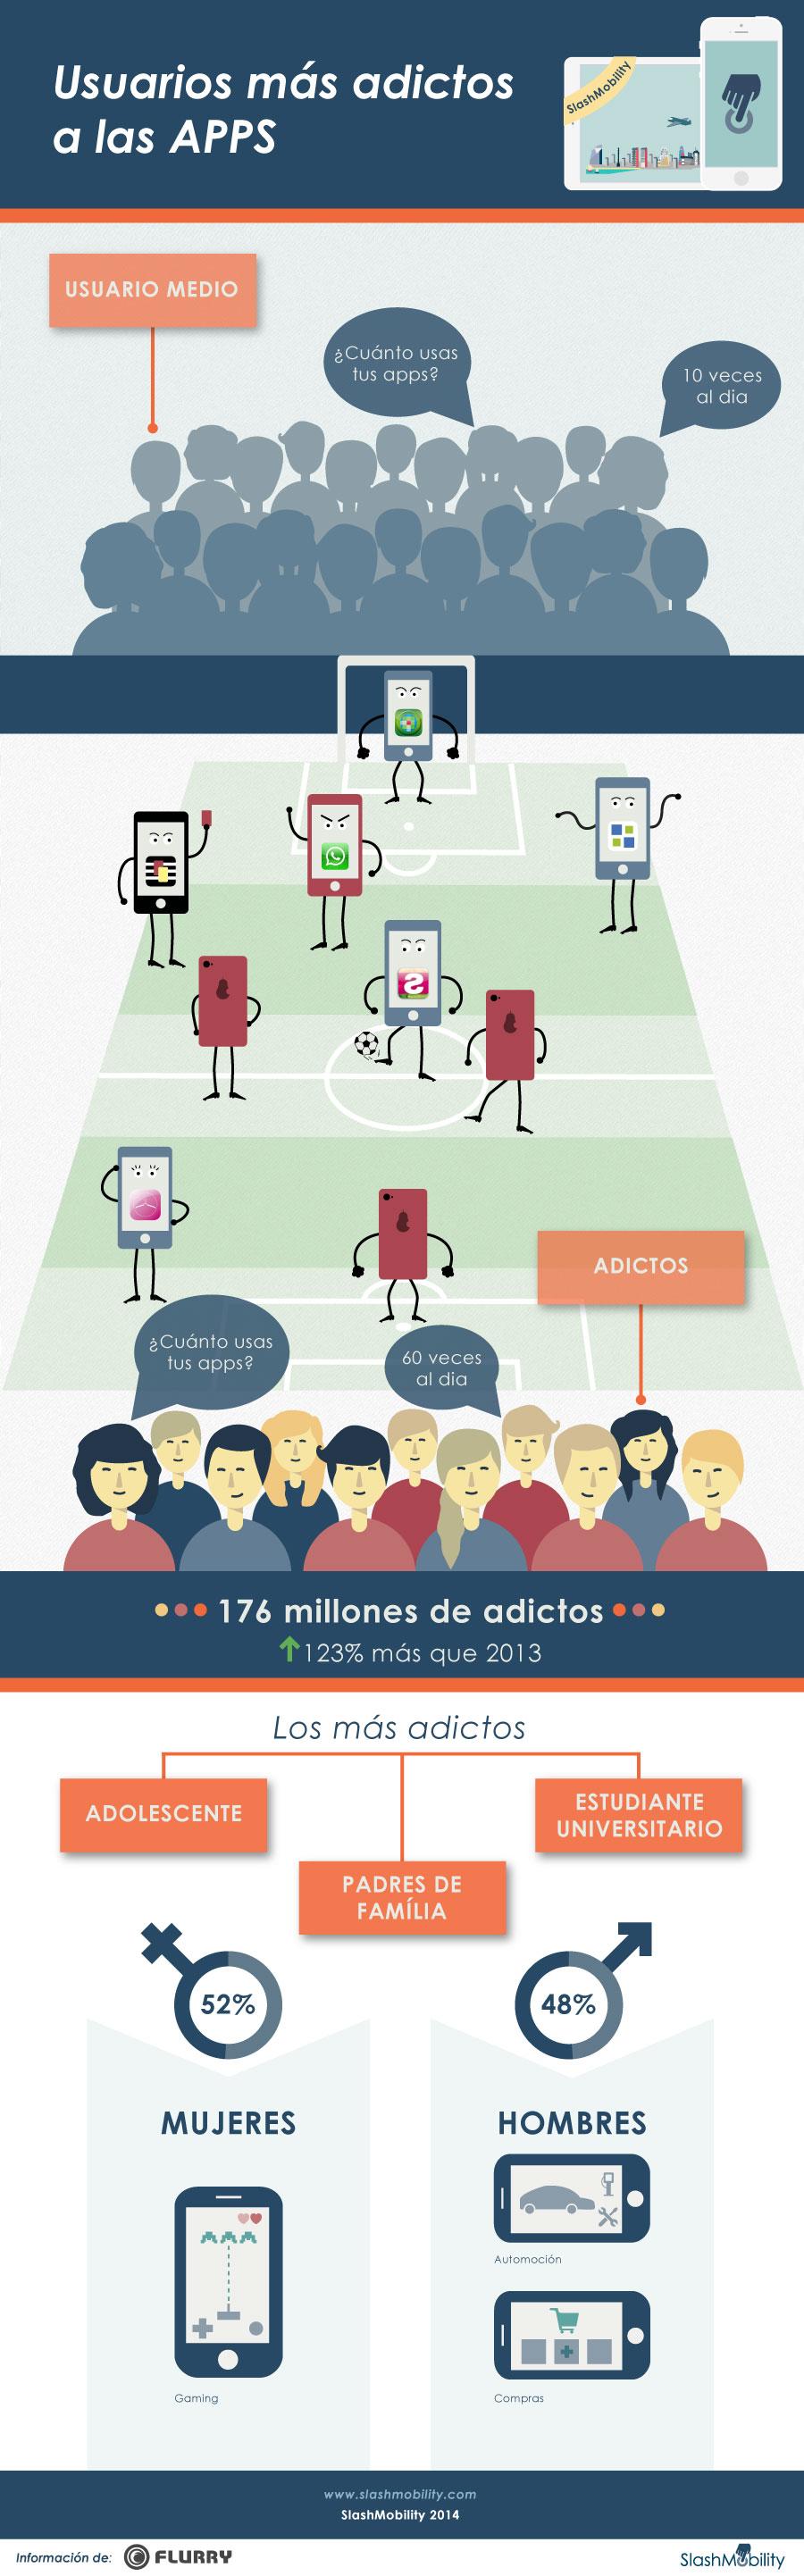 infografia-adictoas-apps